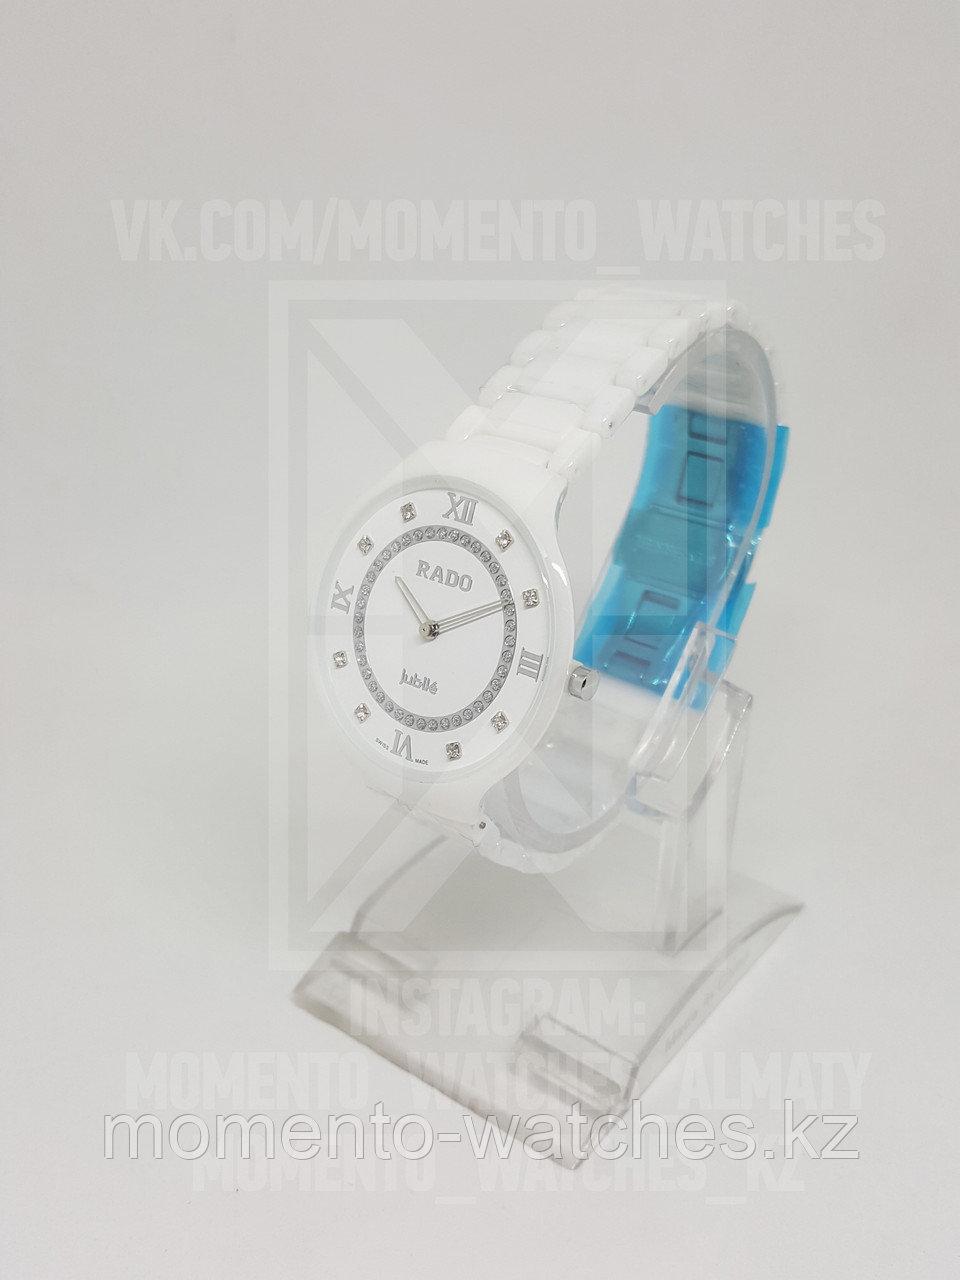 Унисекс часы Rado